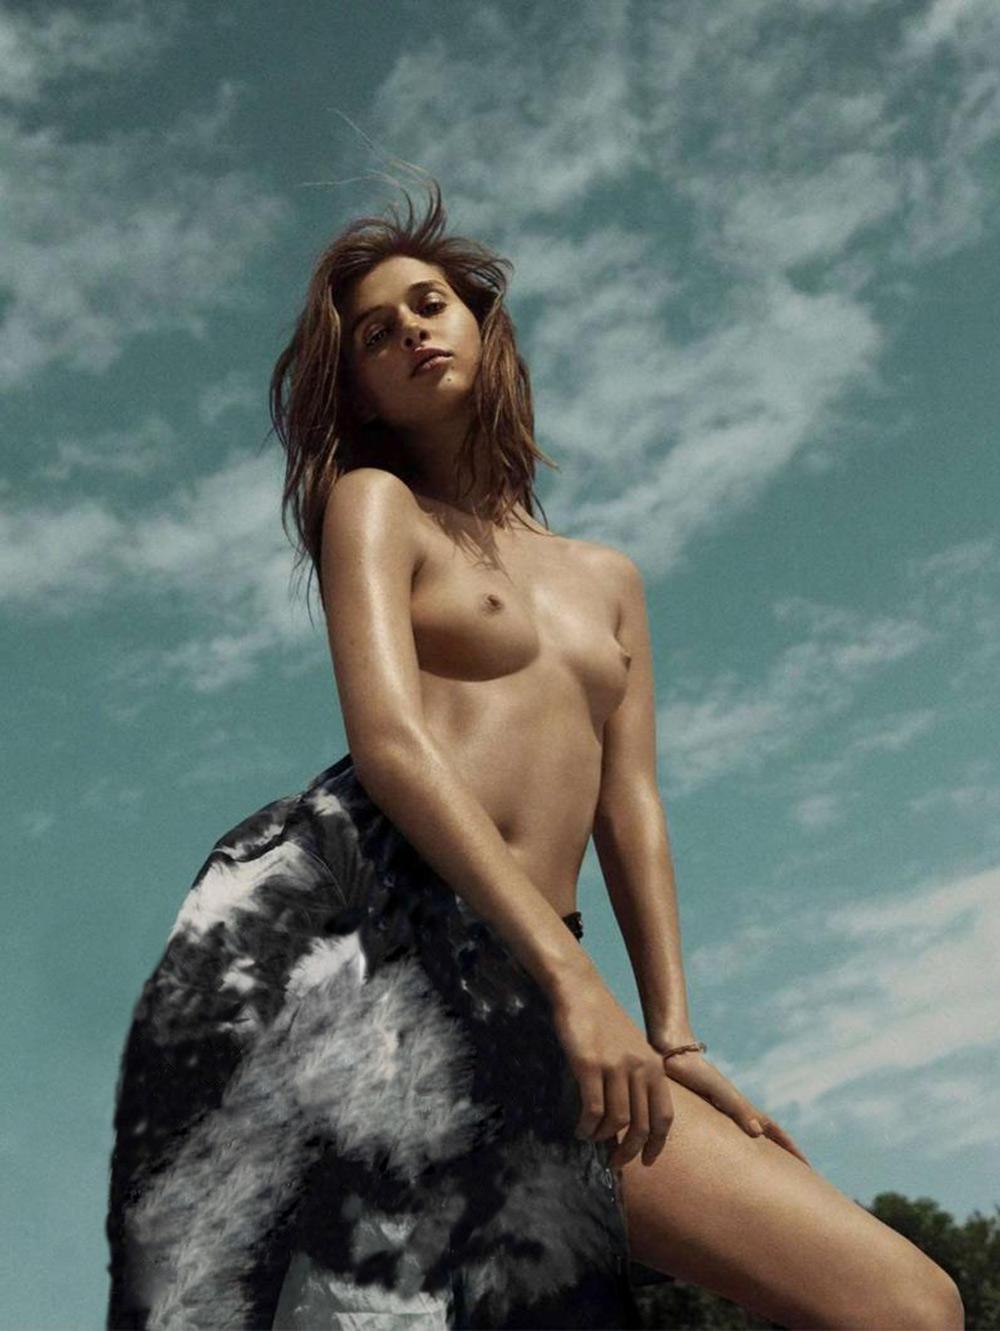 anais pouliot model french hannah khymych photographer photography l'officiel magazine officiel paris june july 2014 editorial beach swim oracle fox oraclefox bikini